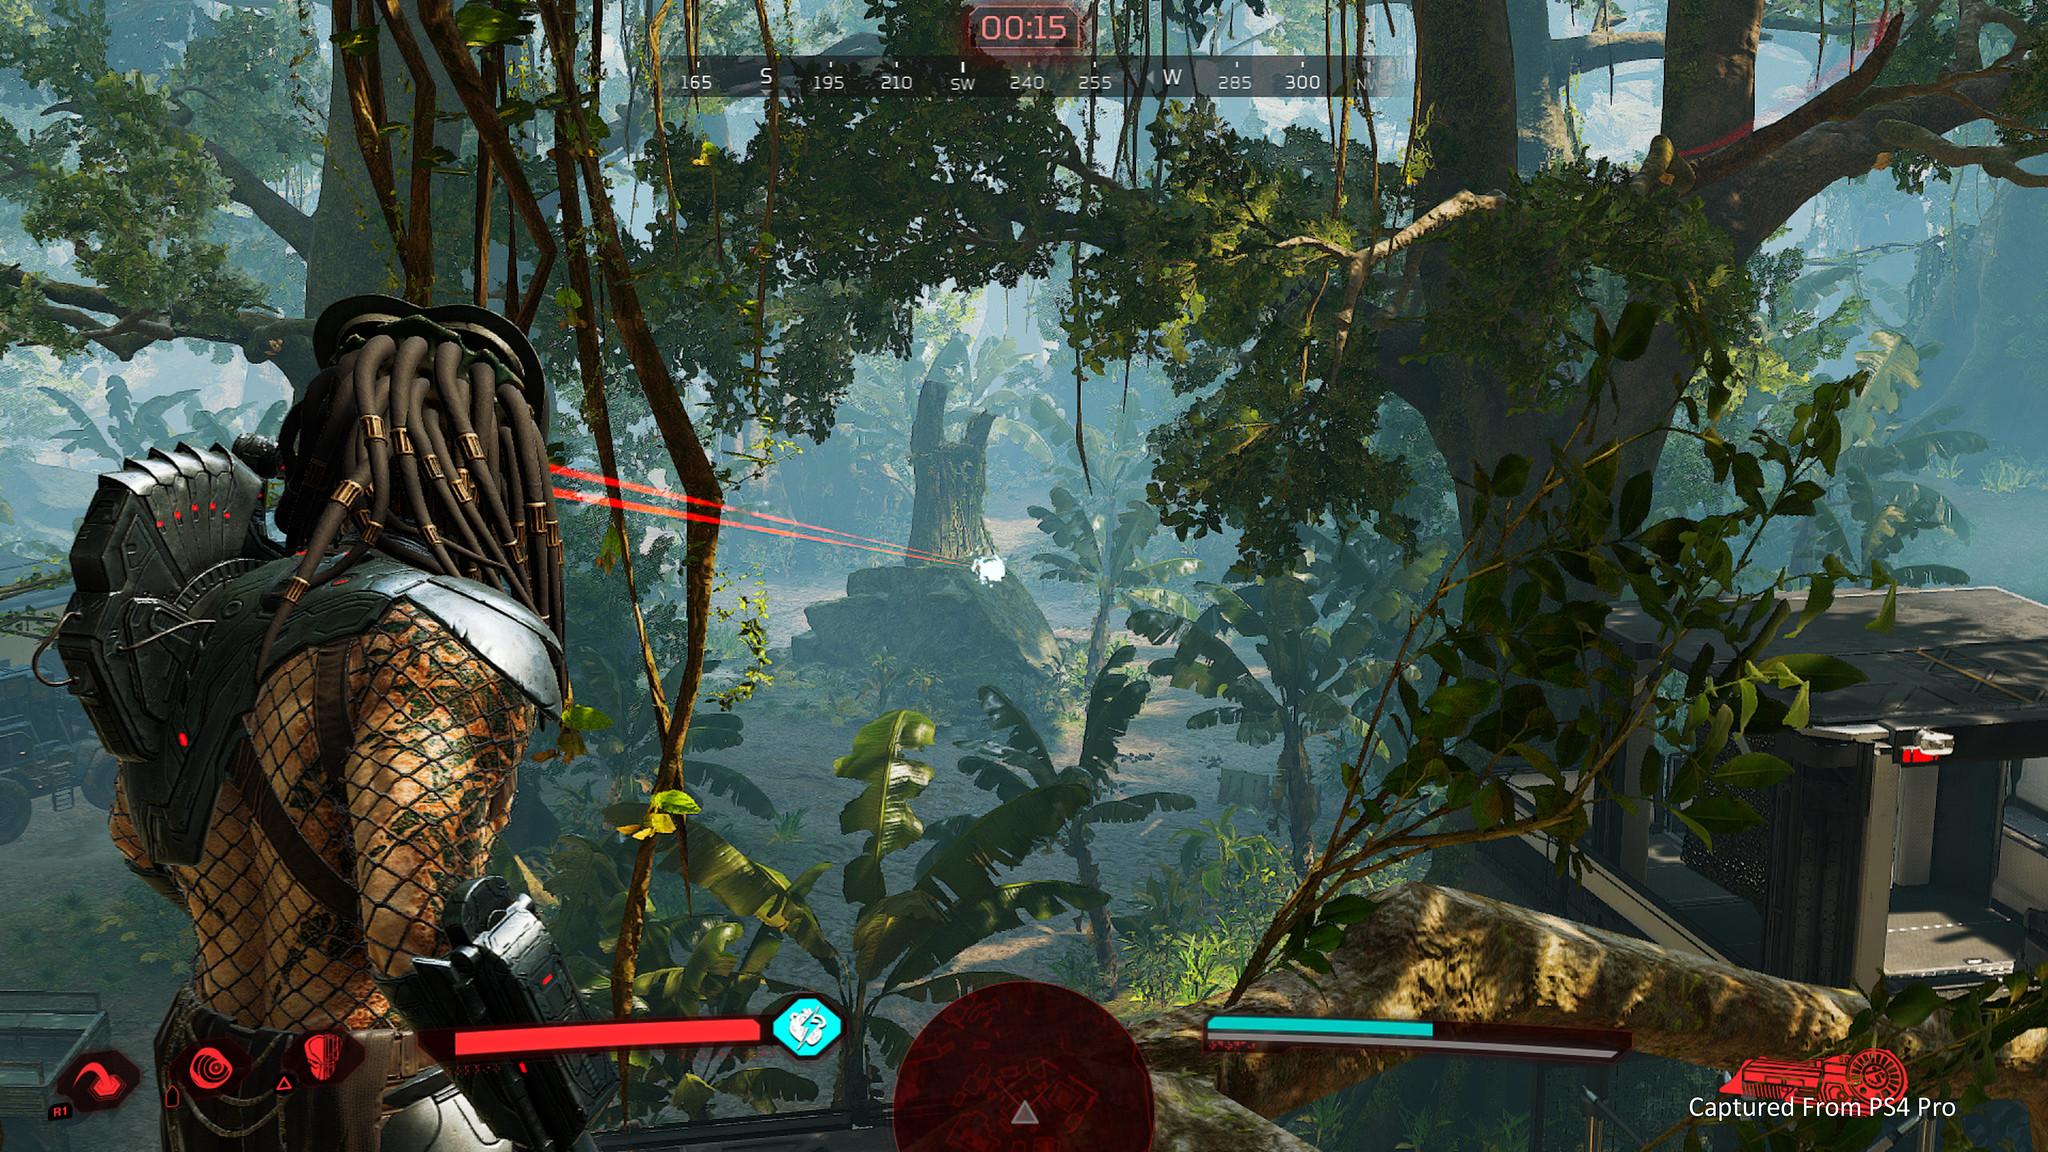 49691434243 26dc93143b k Fin de semana gratuito, prueba Predator: Hunting Grounds antes de su estreno